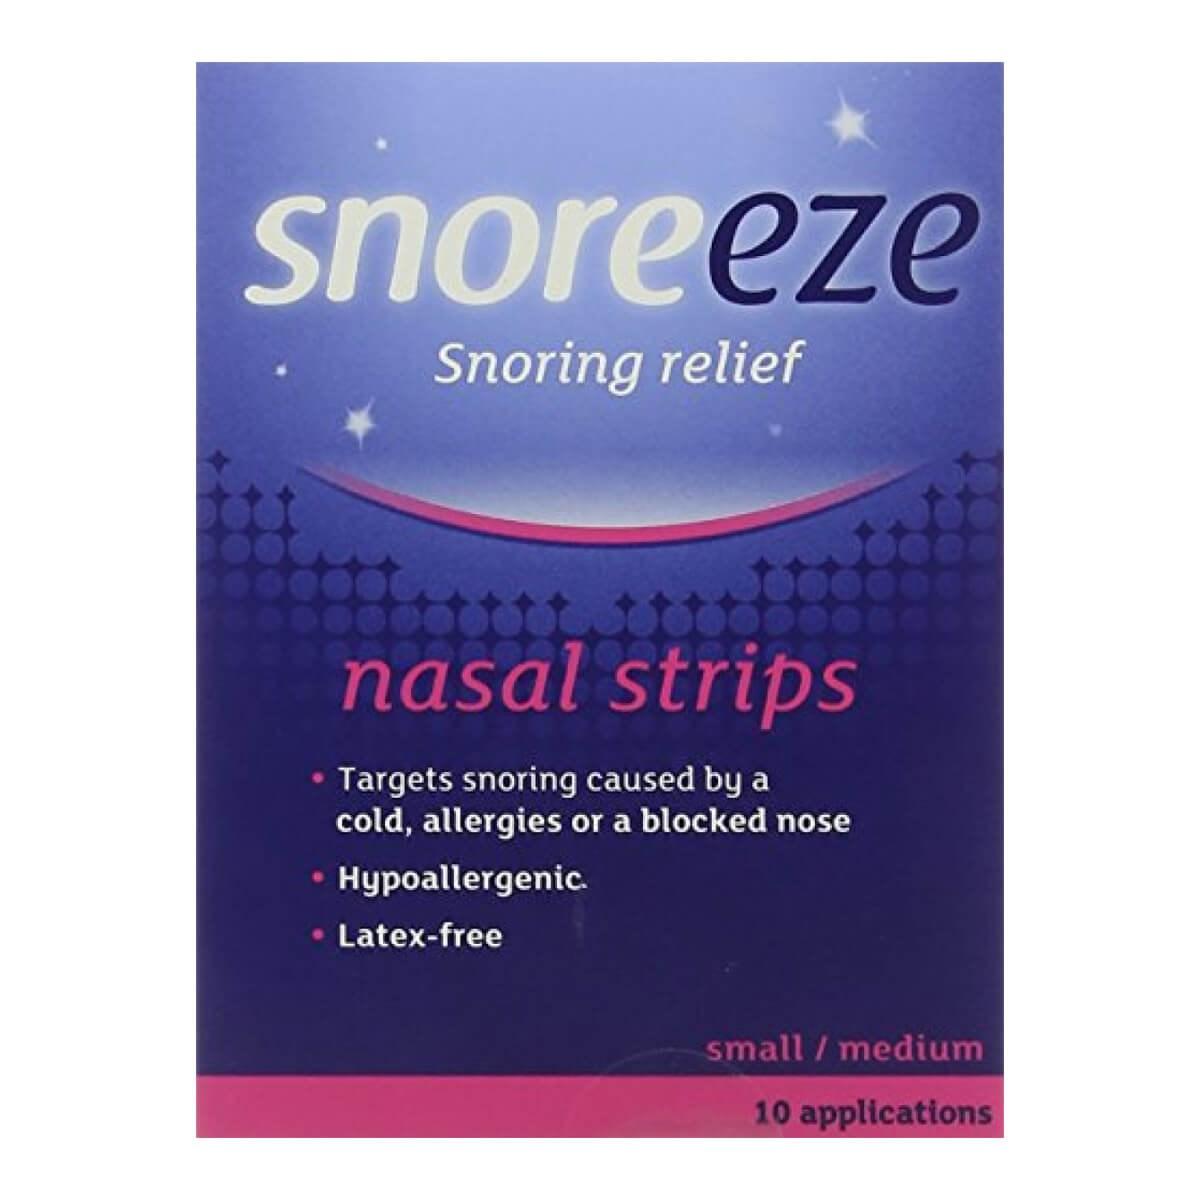 Snoreeze Snoring Relief Nasal Strips - Small/Medium